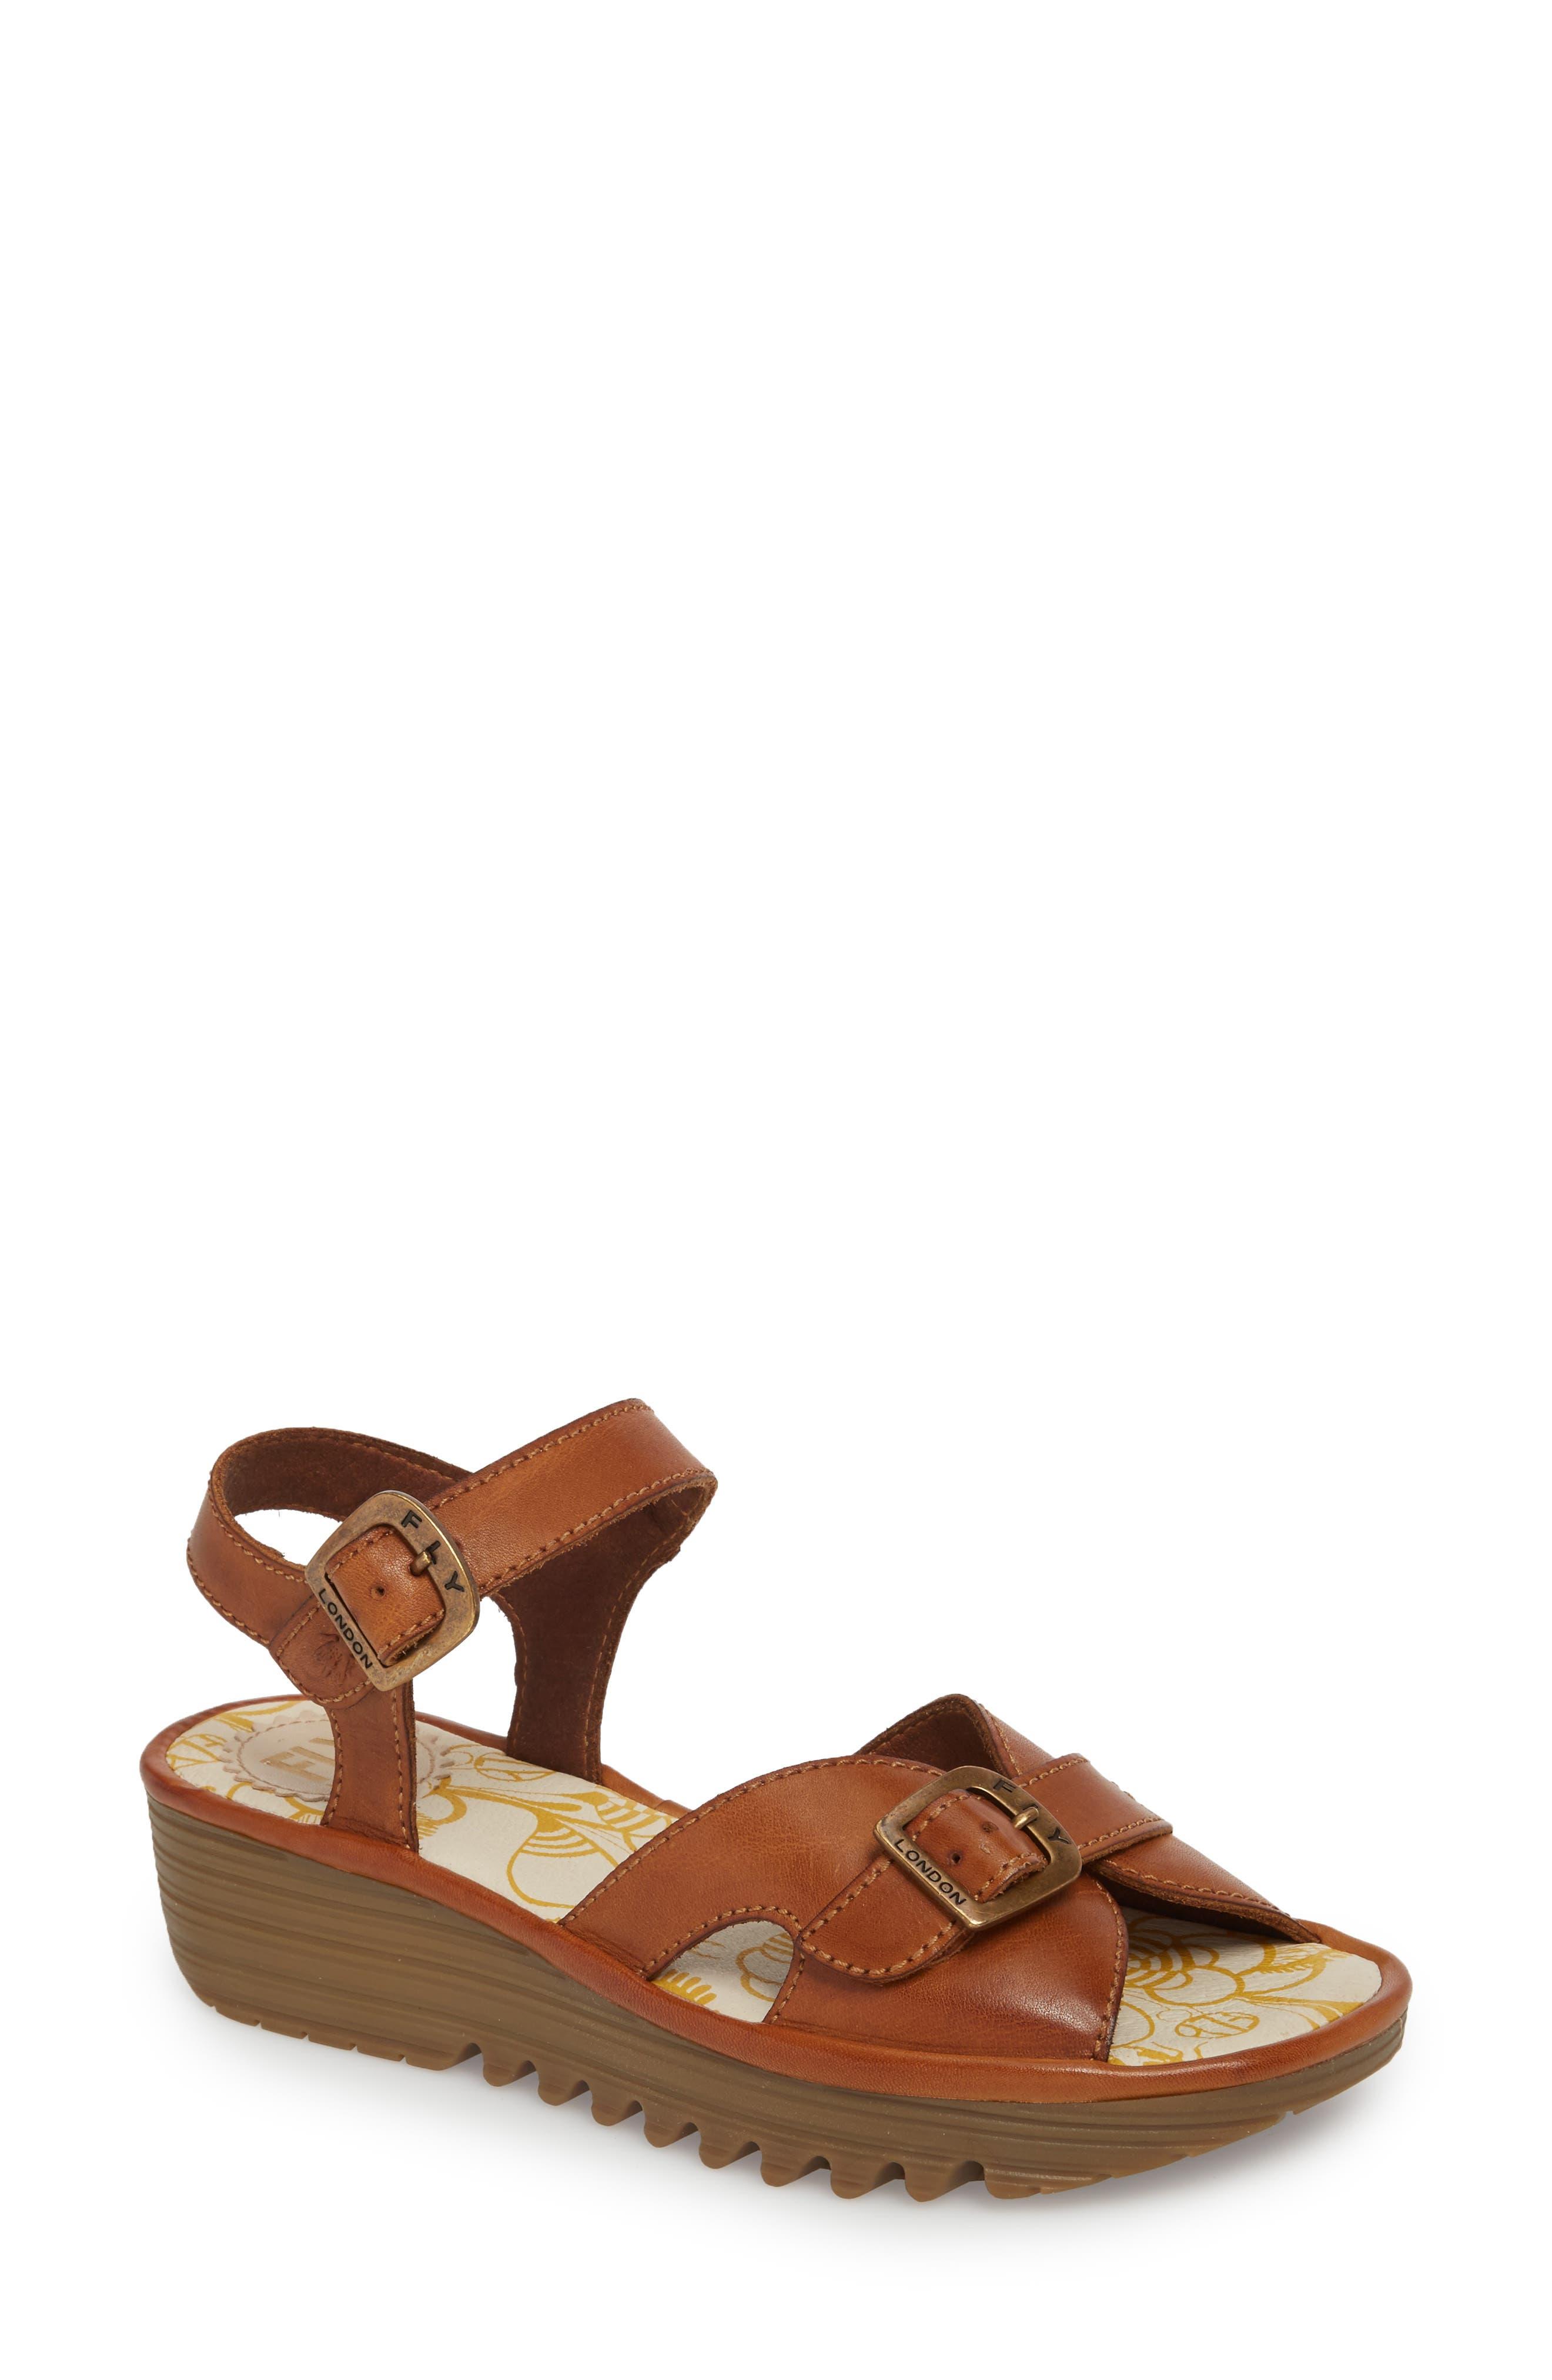 Egal Sandal,                         Main,                         color, Tan Colmar Leather